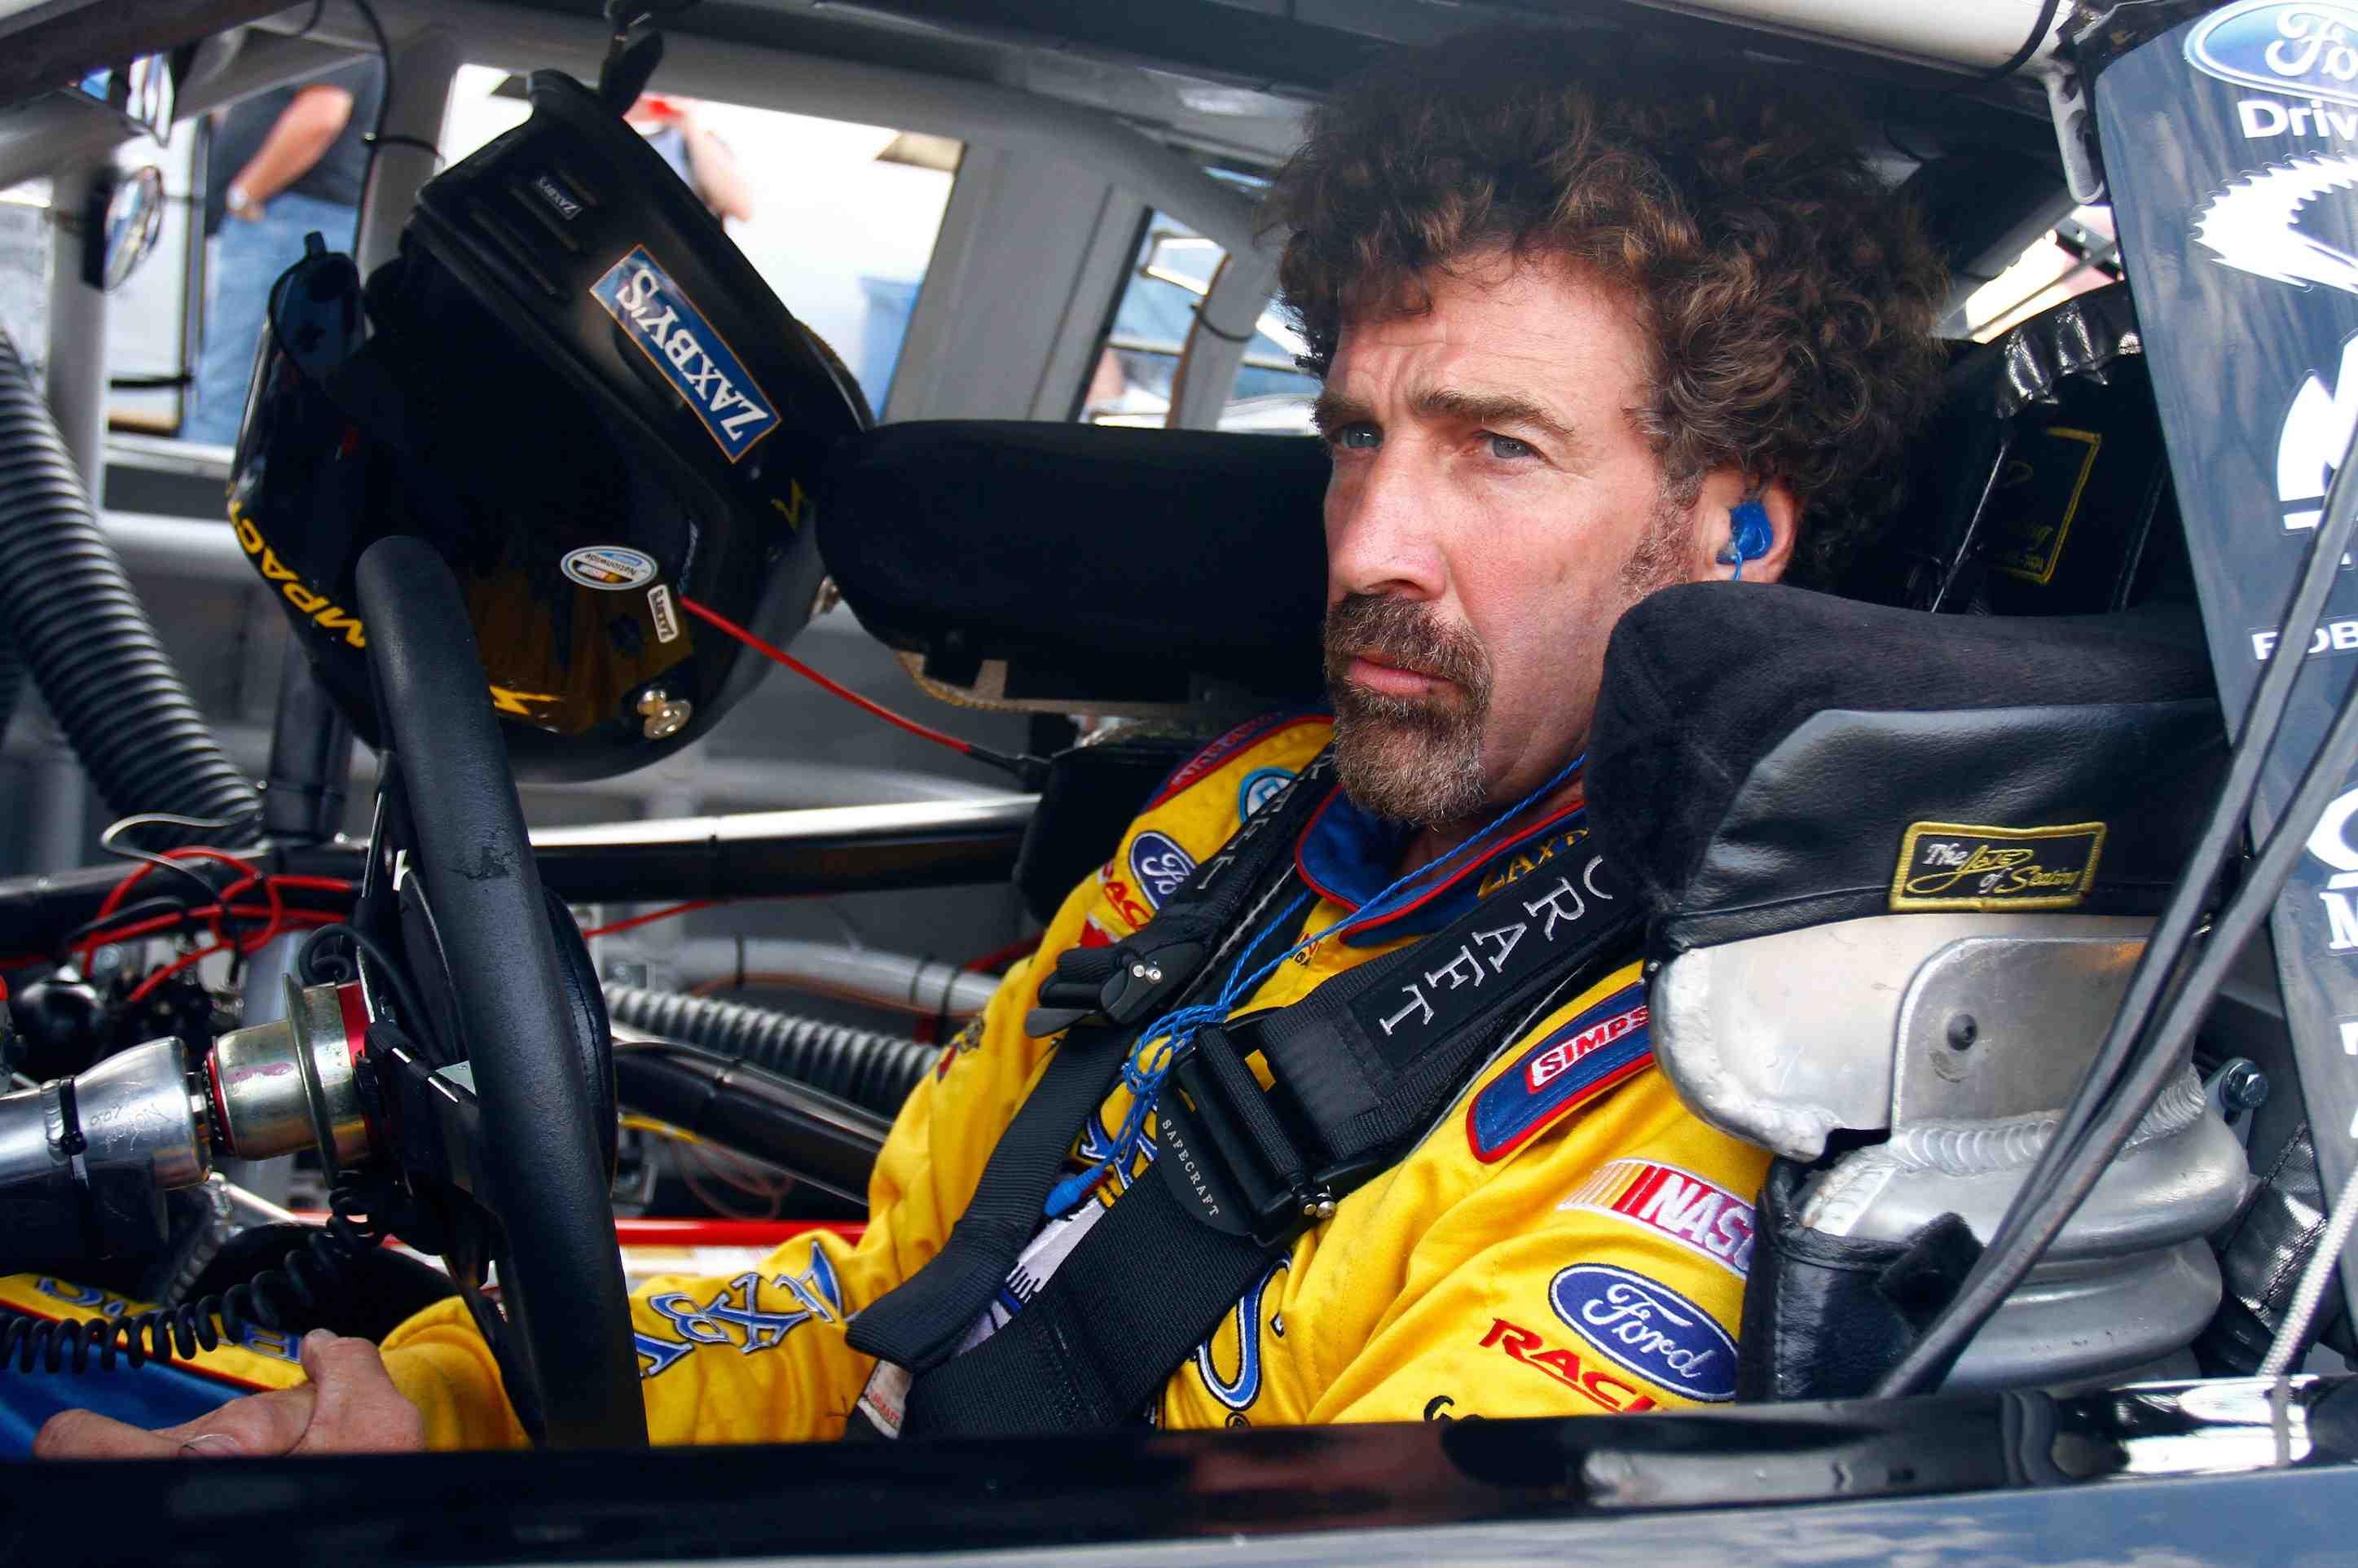 Boris Said wins first NASCAR Nationwide race